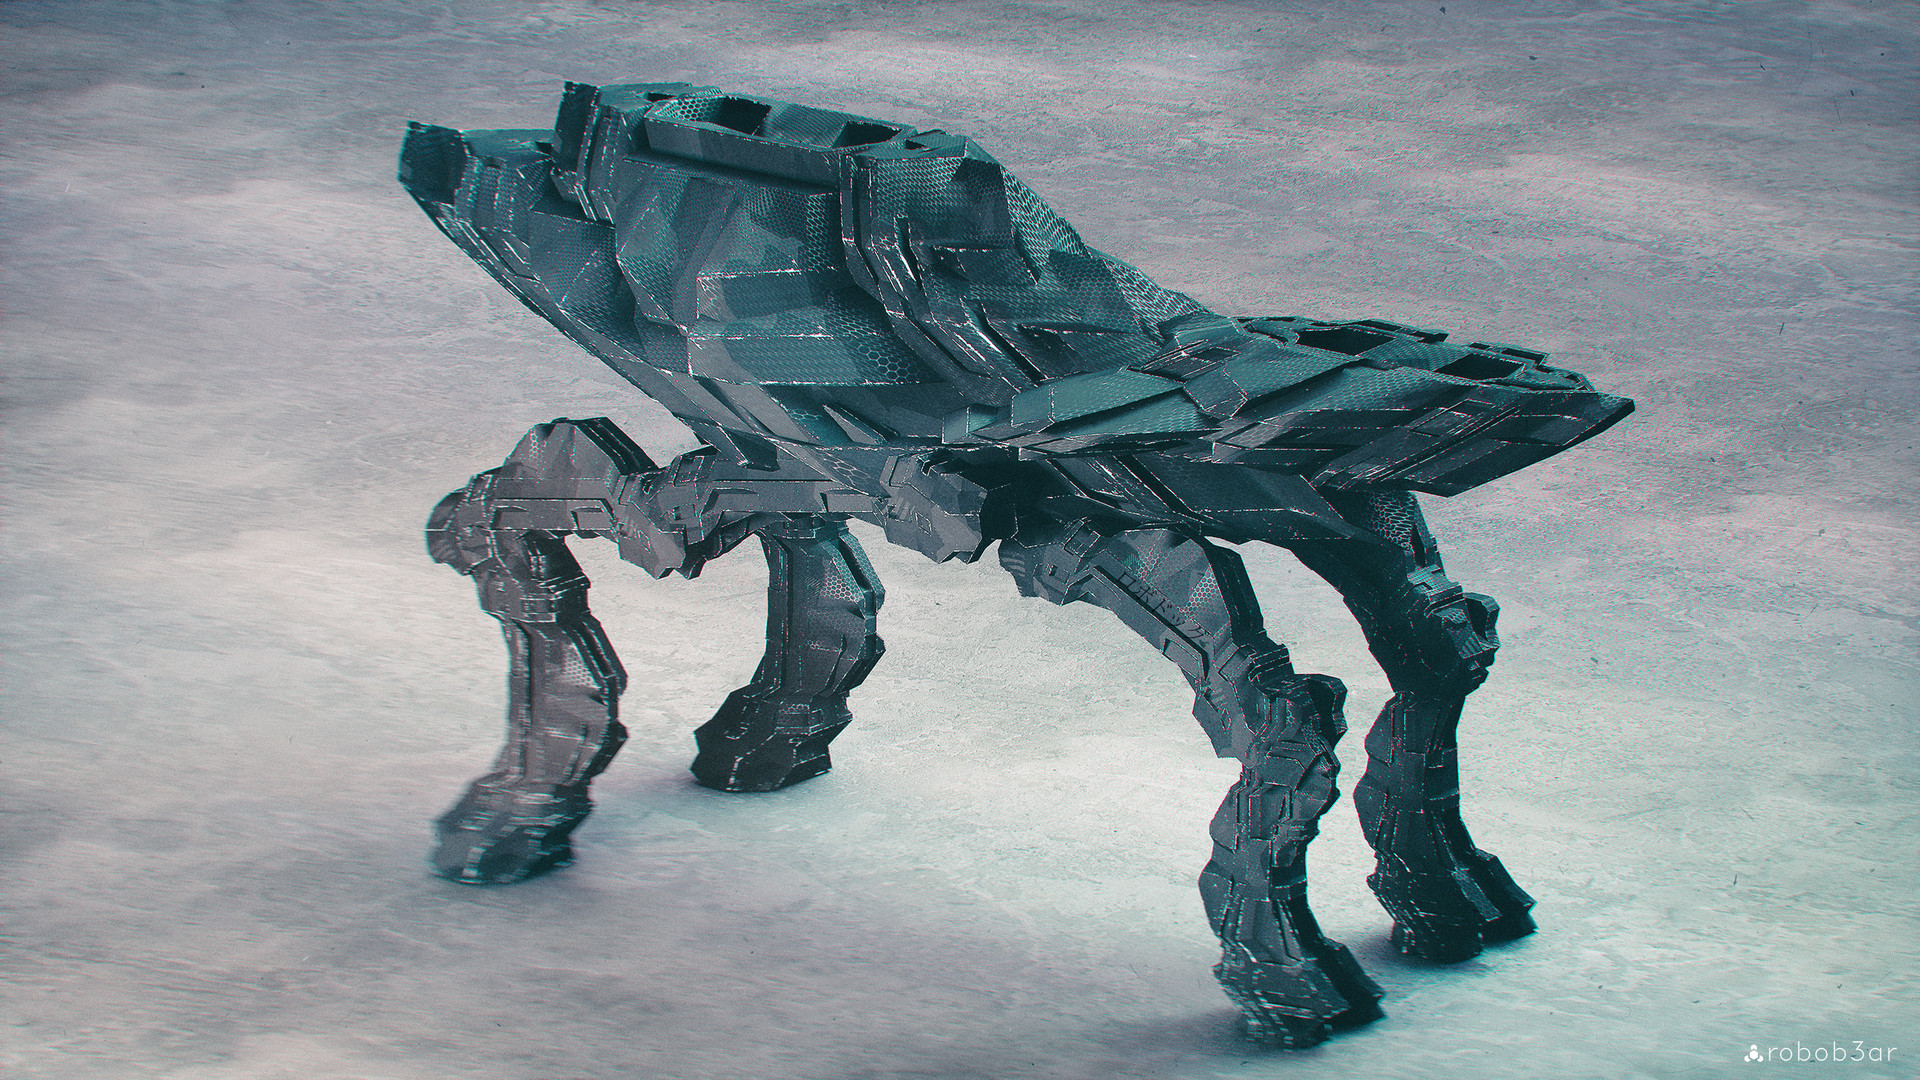 Kresimir jelusic robob3ar 489 robodog ps3 2560px